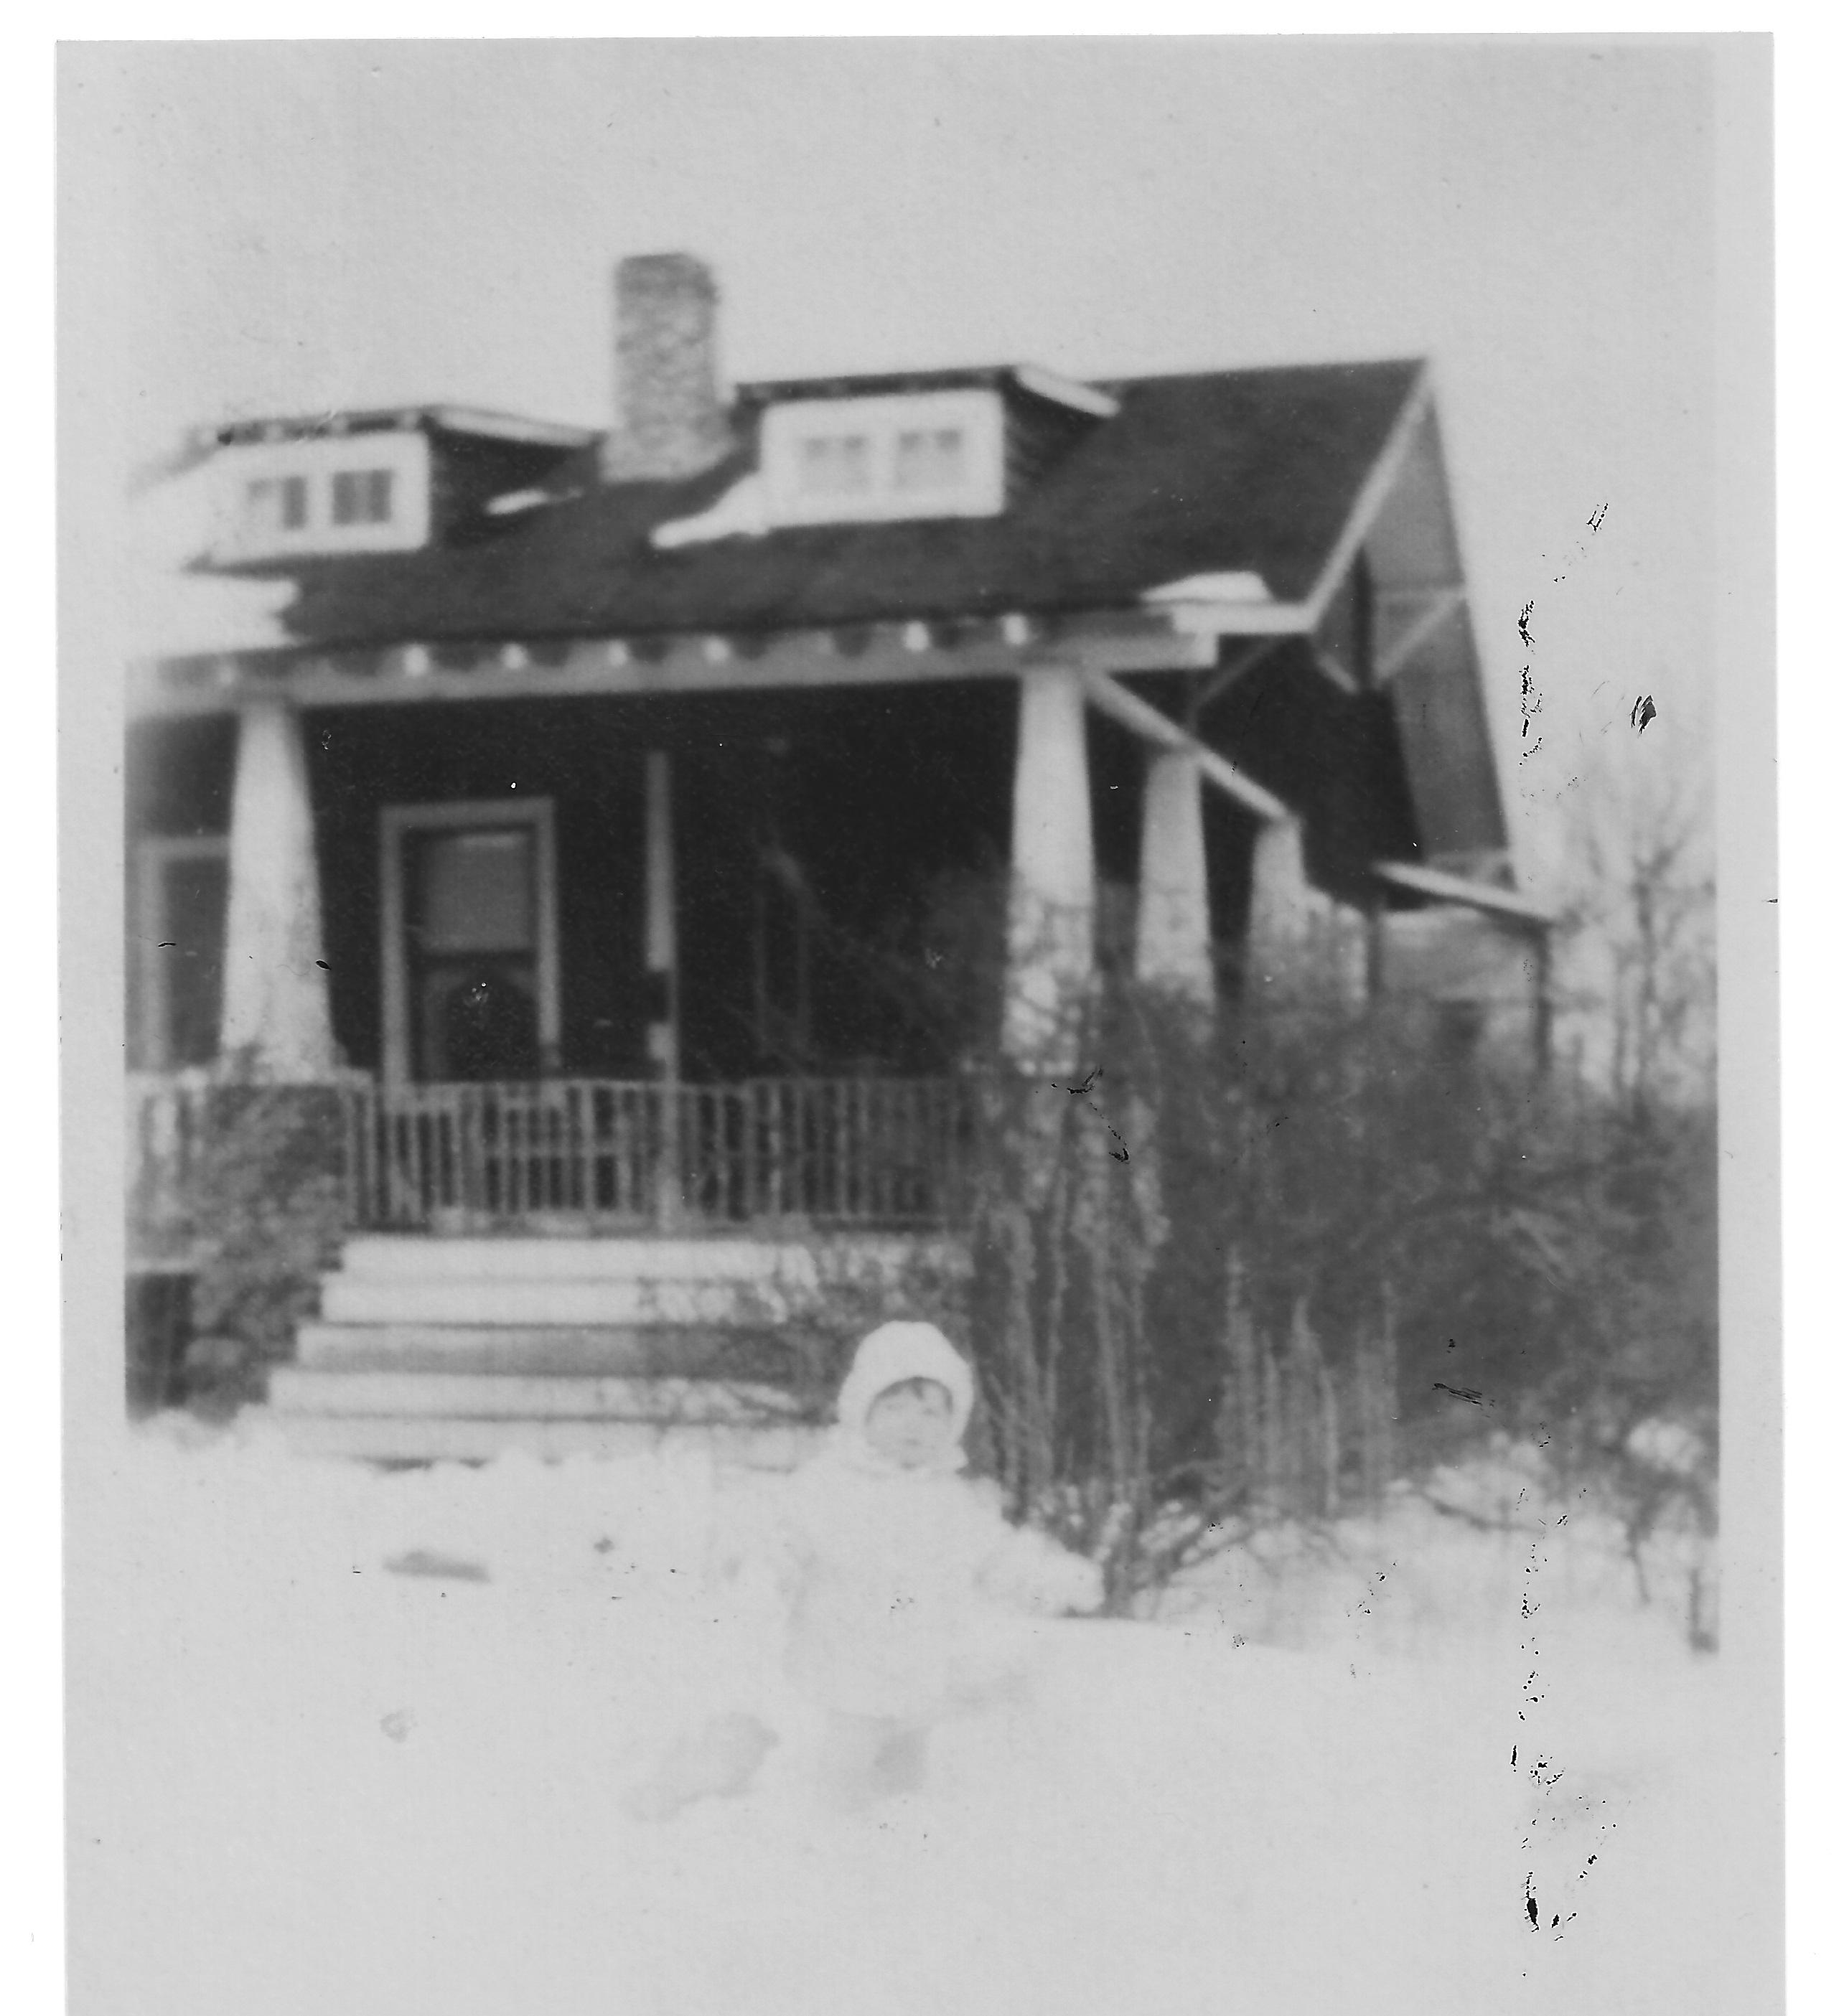 Gustave Whitehead's self-built Alvin Street home circa 1930's